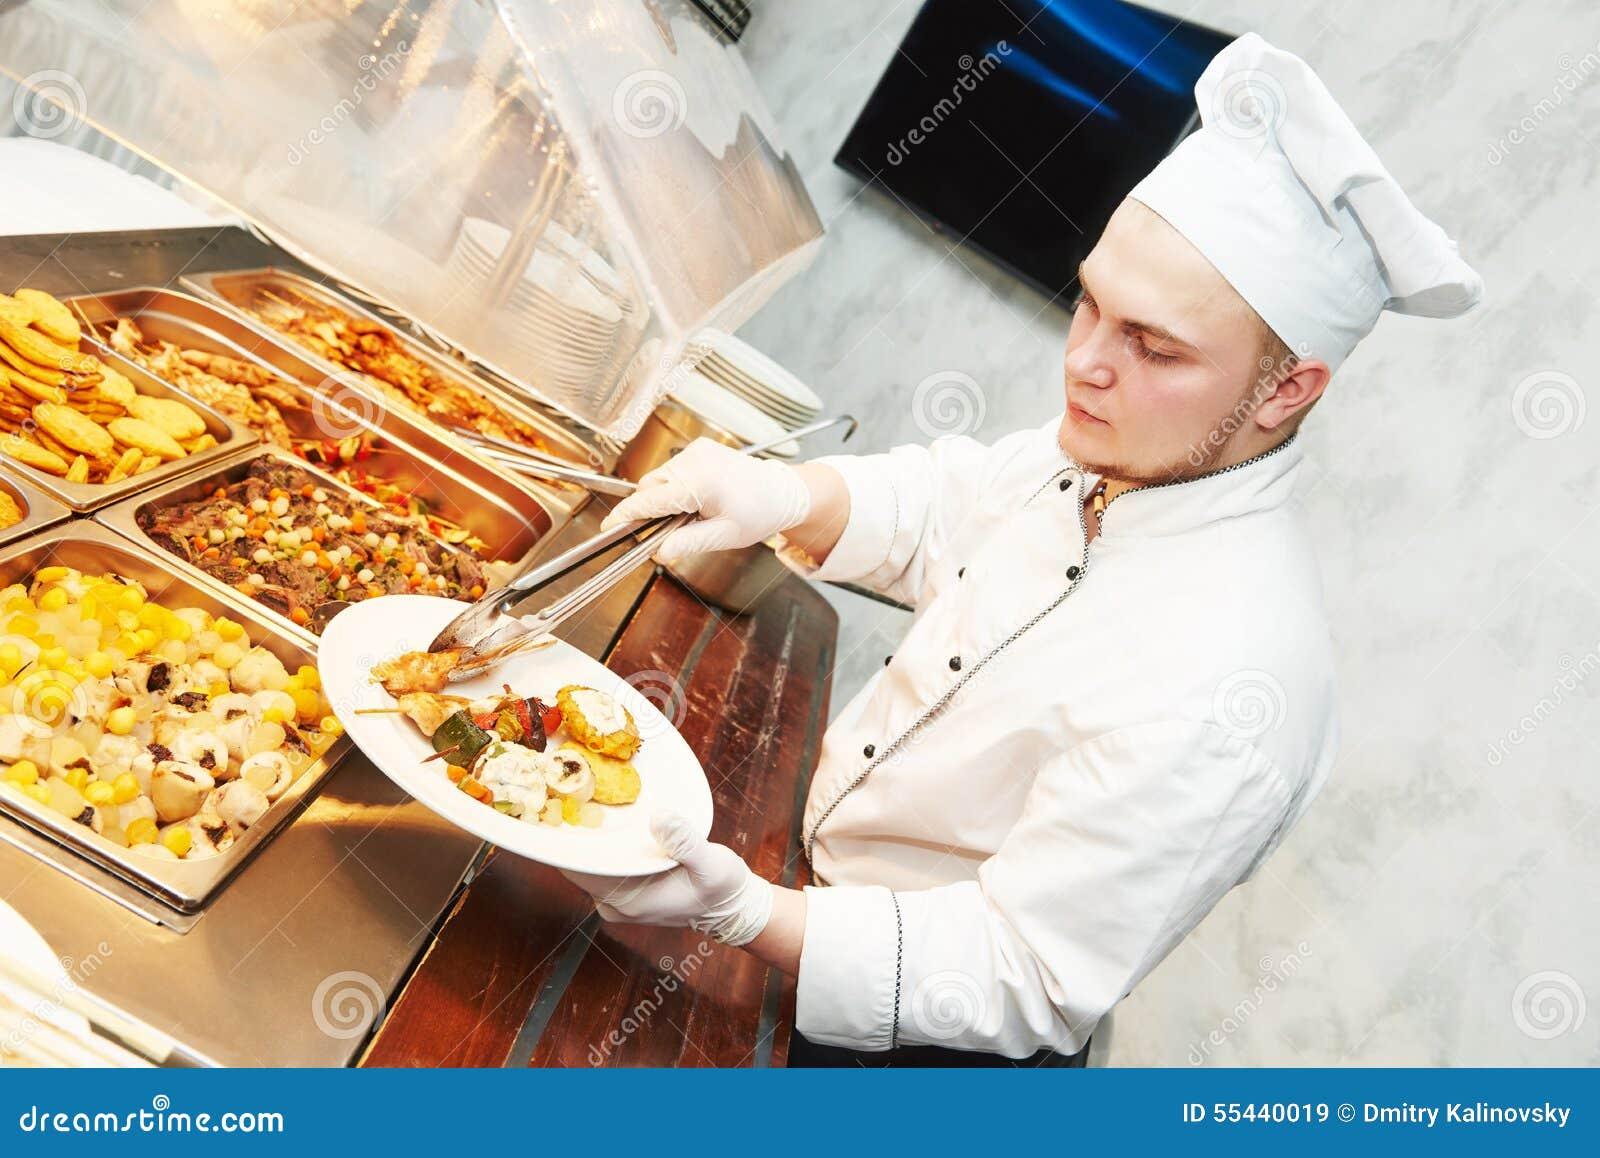 Serving At A Soup Kitchen